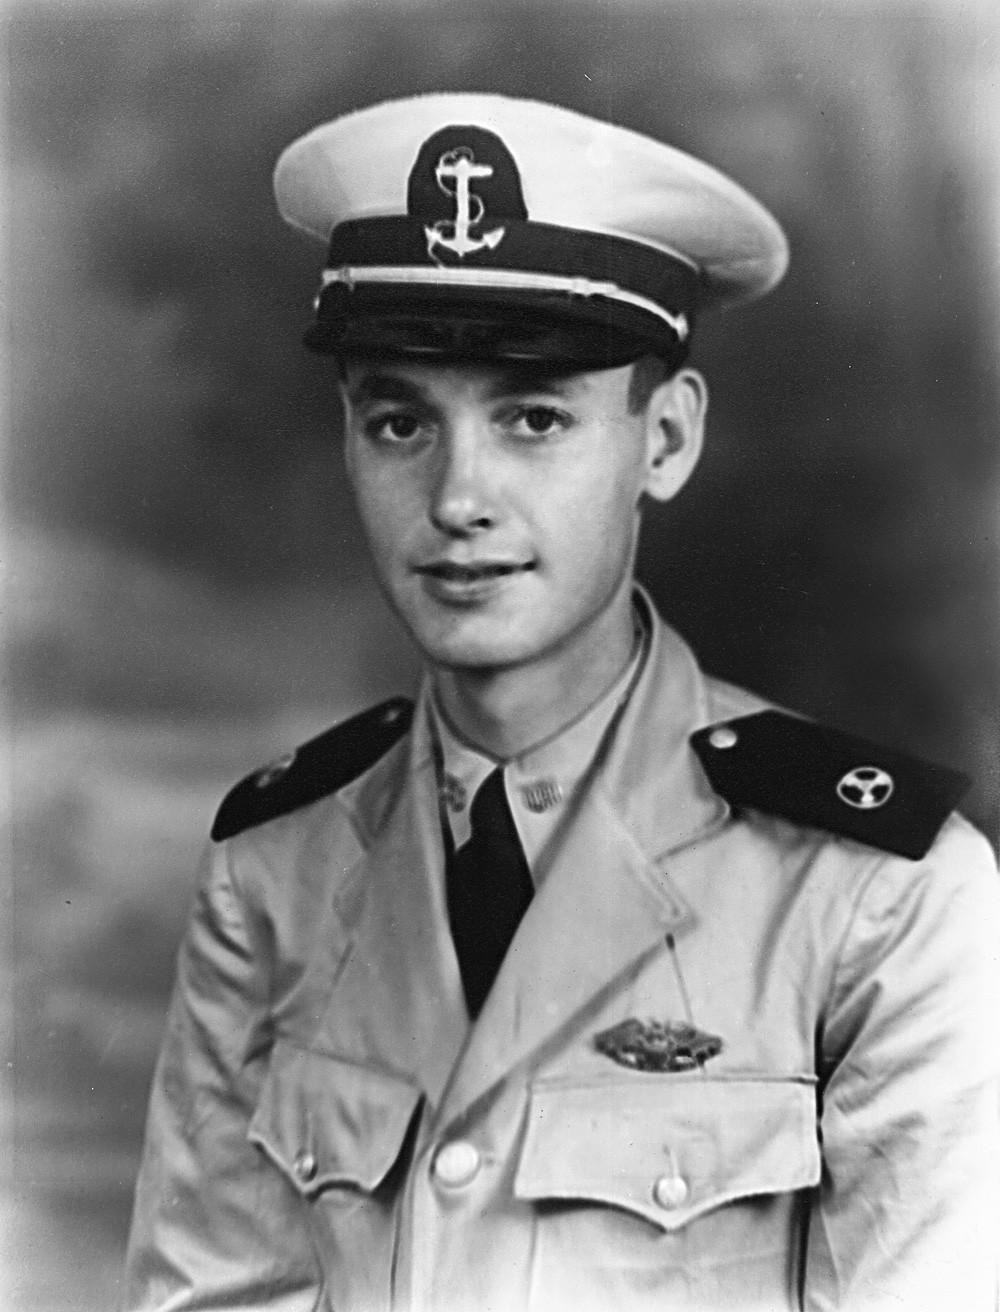 Херман Мелтон, јул 1943.